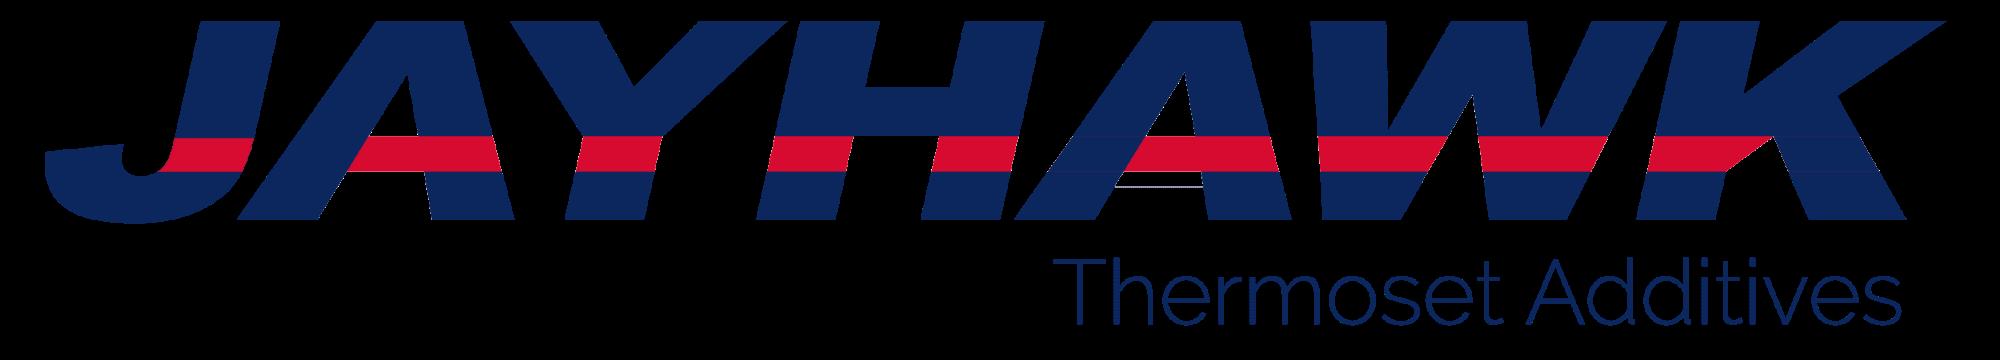 JAYHAWK Thermoset Additives